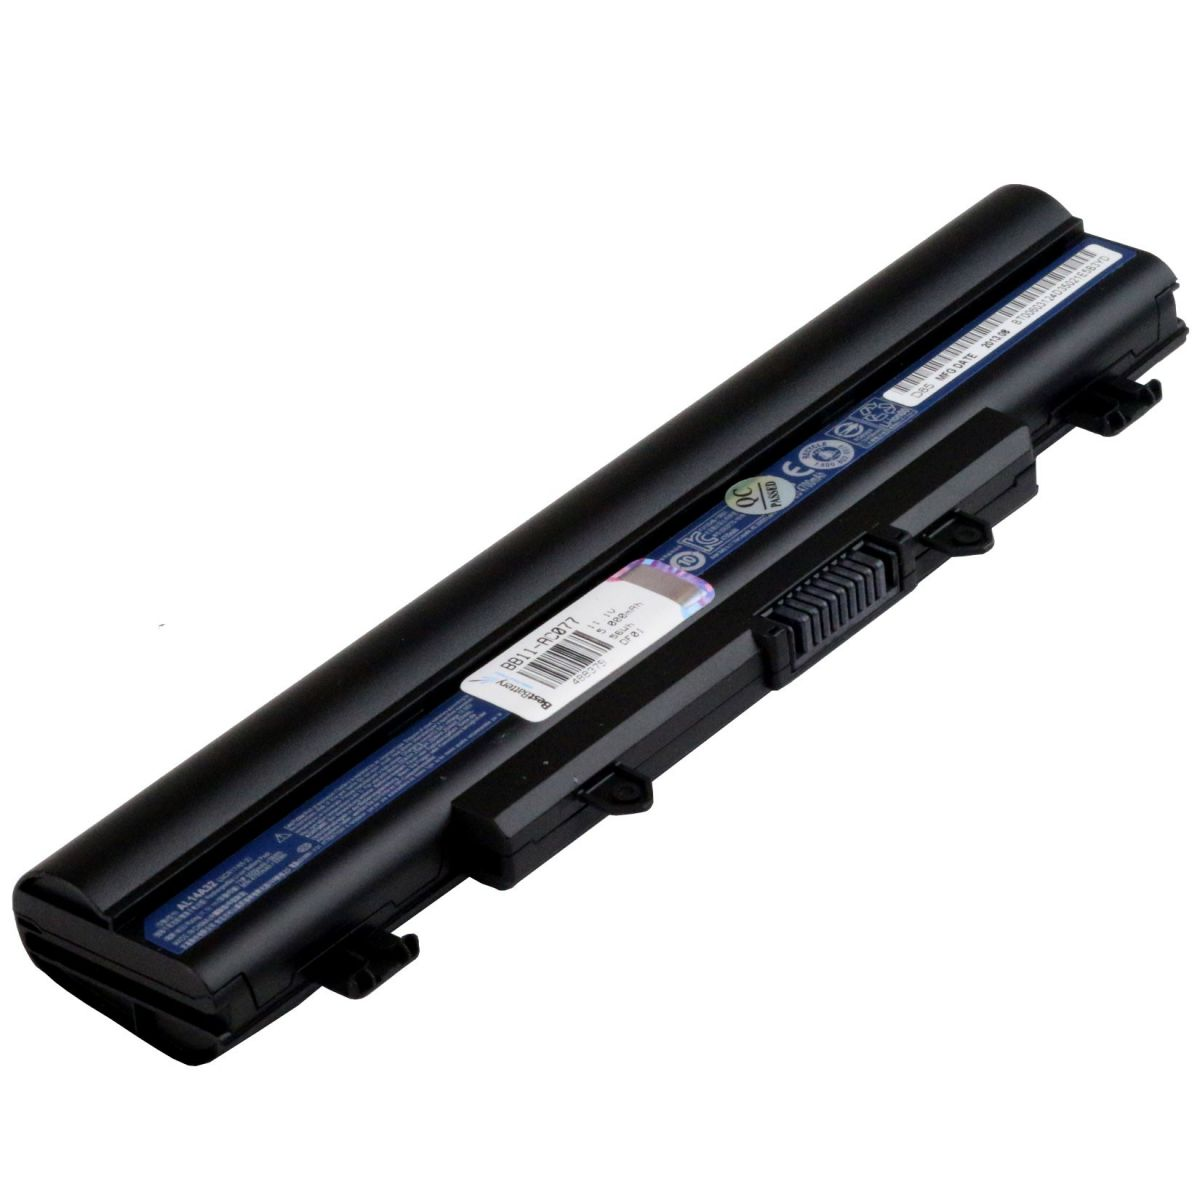 Bateria Semi Nova AL14A32 11.1v 4700mAh Notebook Acer E5 571Z5WAH